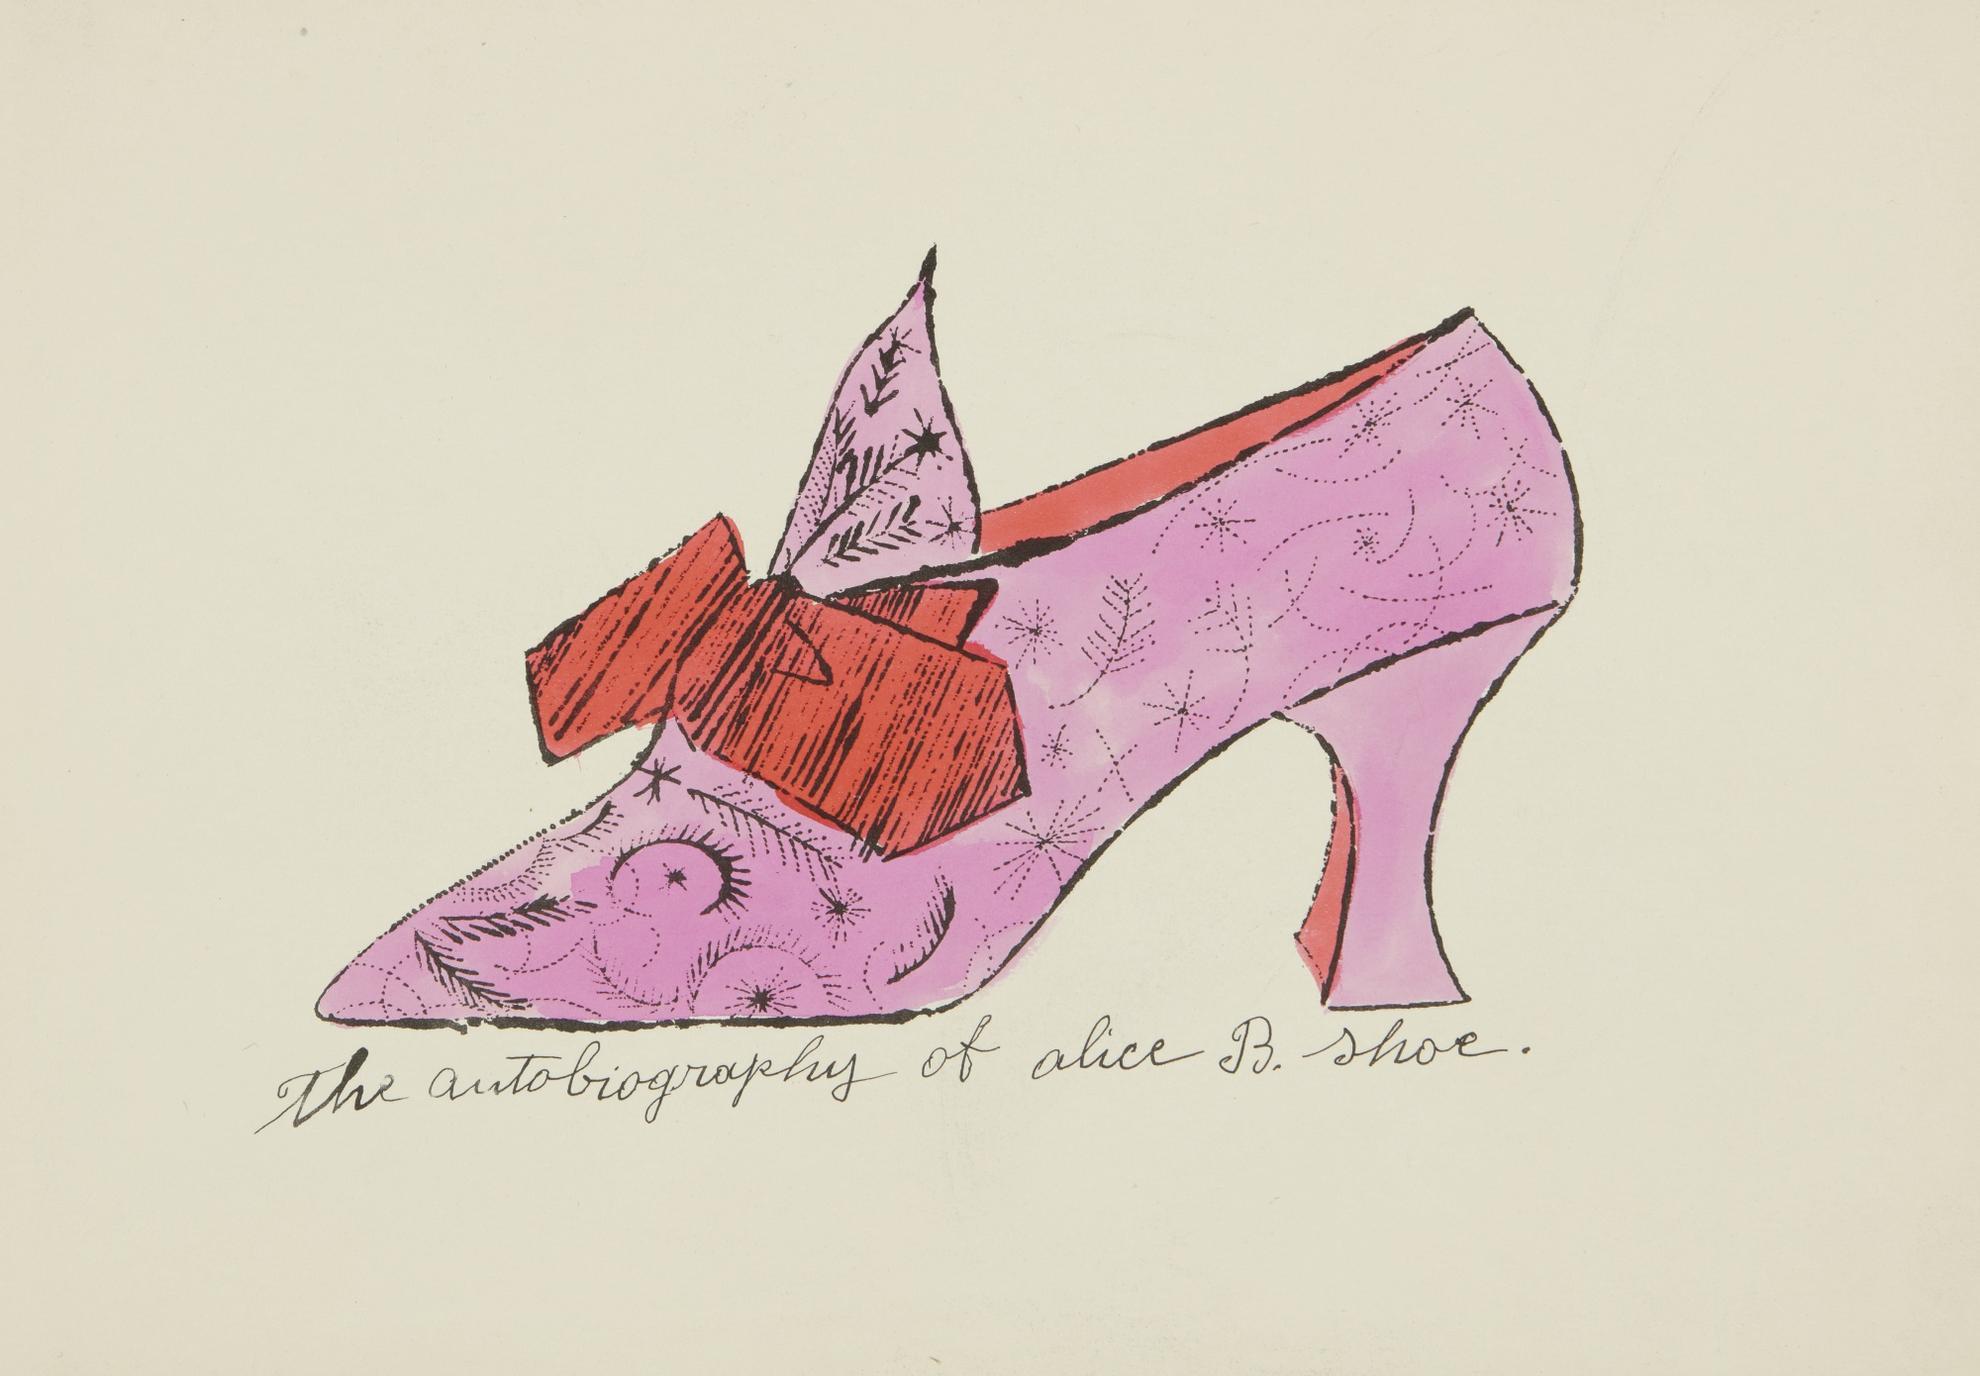 Andy Warhol-A La Recherche Du Shoe Perdu (F. & S. Iv.69 - 73, 75 - 81, 83, 85)-1955